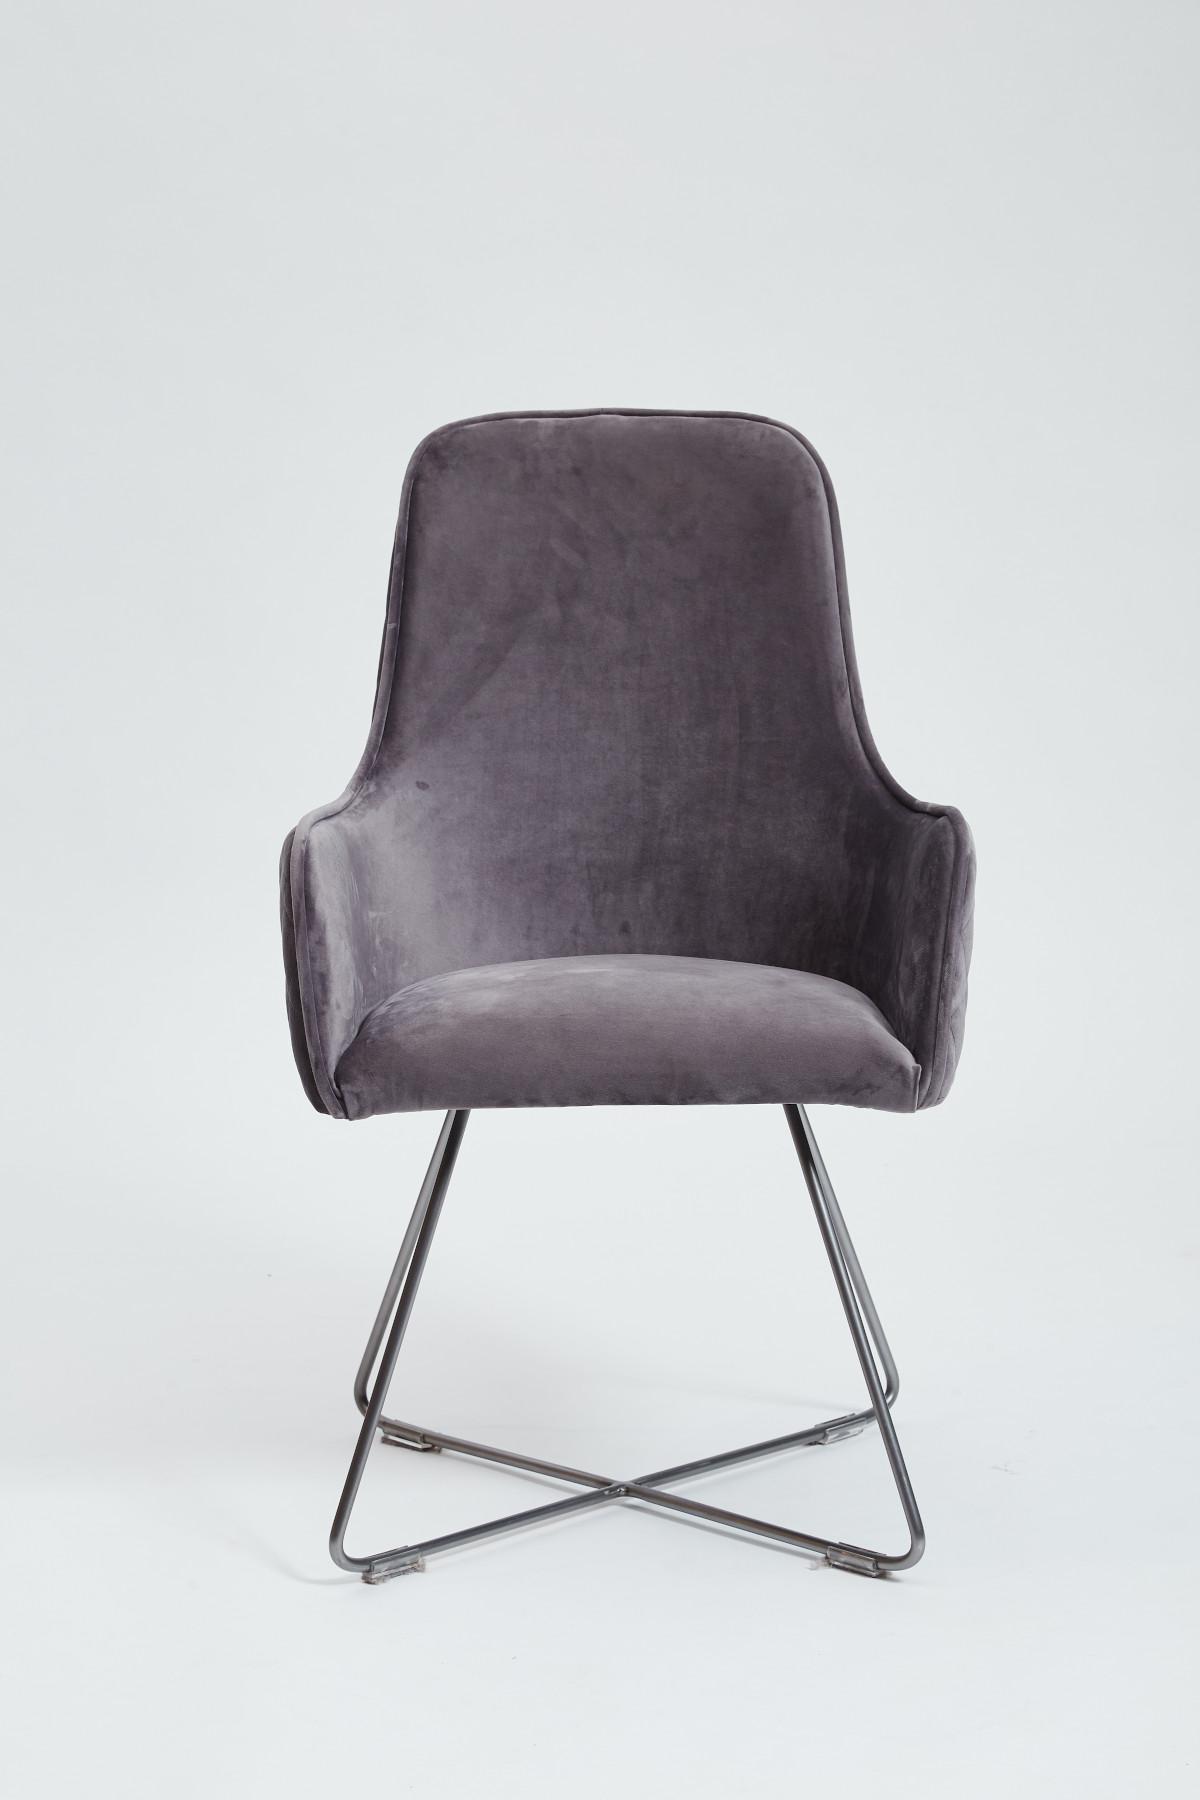 Utah Dining Chair - Plush Steel